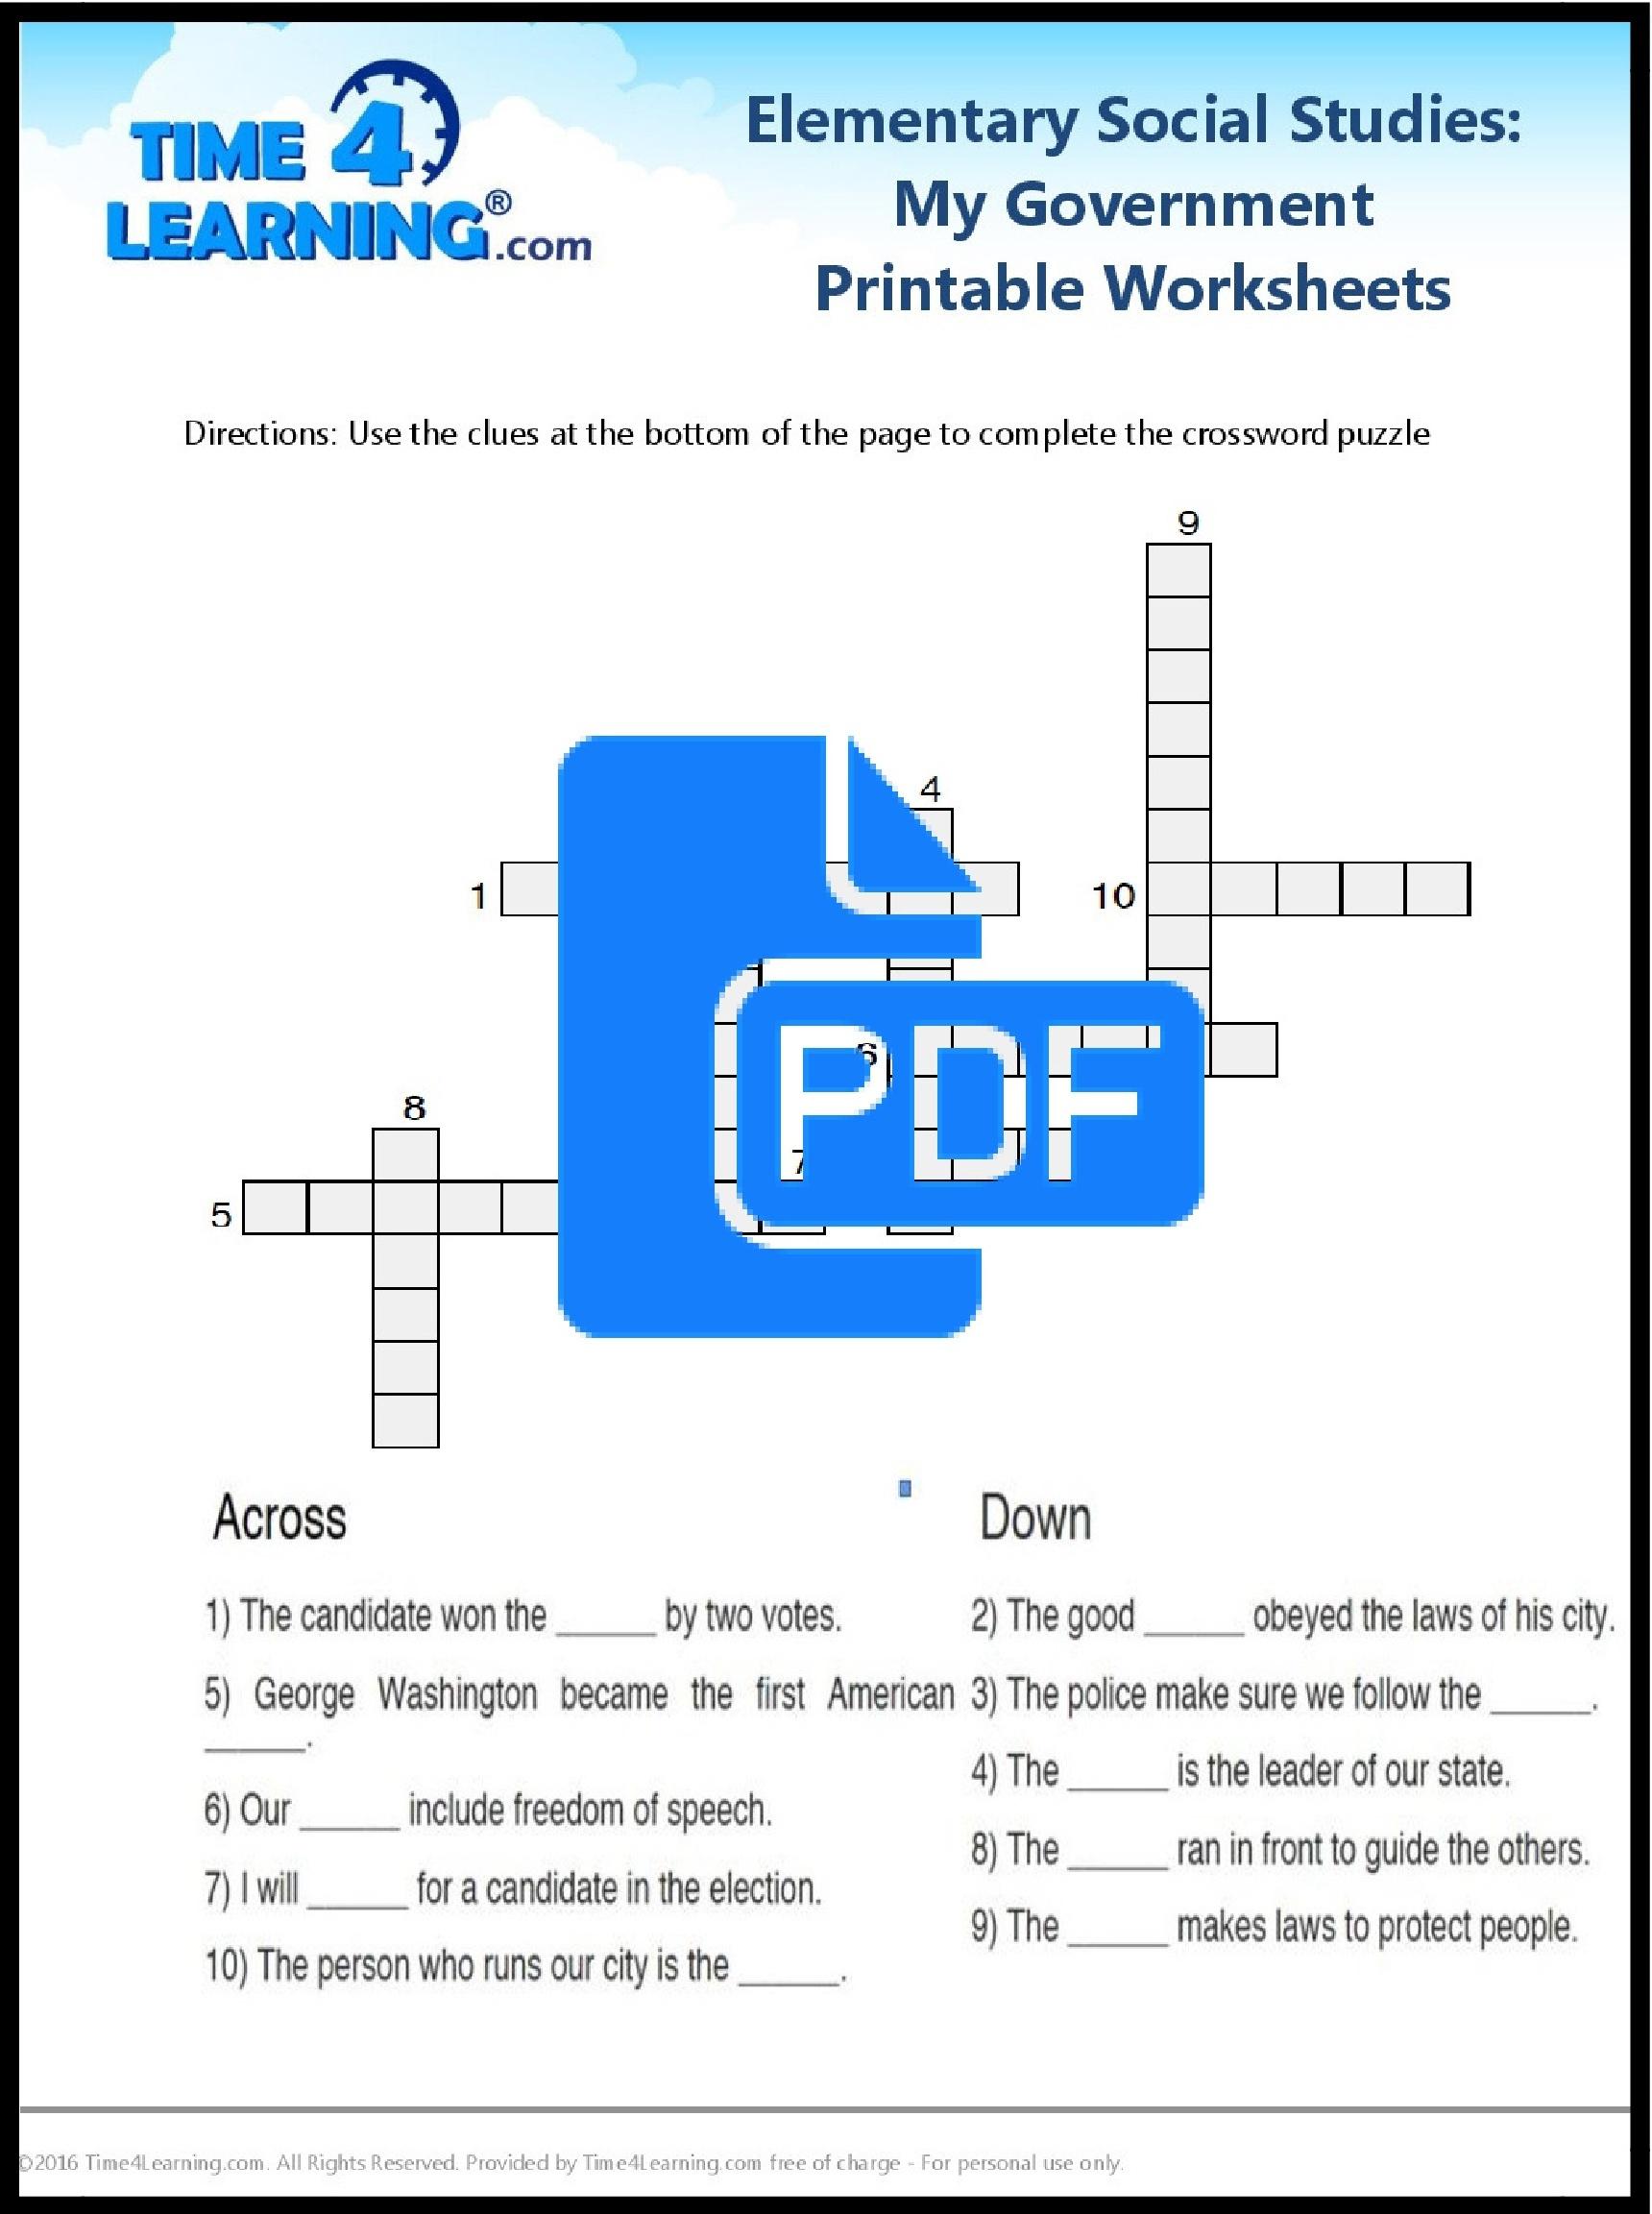 Free Printable: Elementary Social Studies Worksheet | Time4Learning - Free Printable Worksheets For 2Nd Grade Social Studies